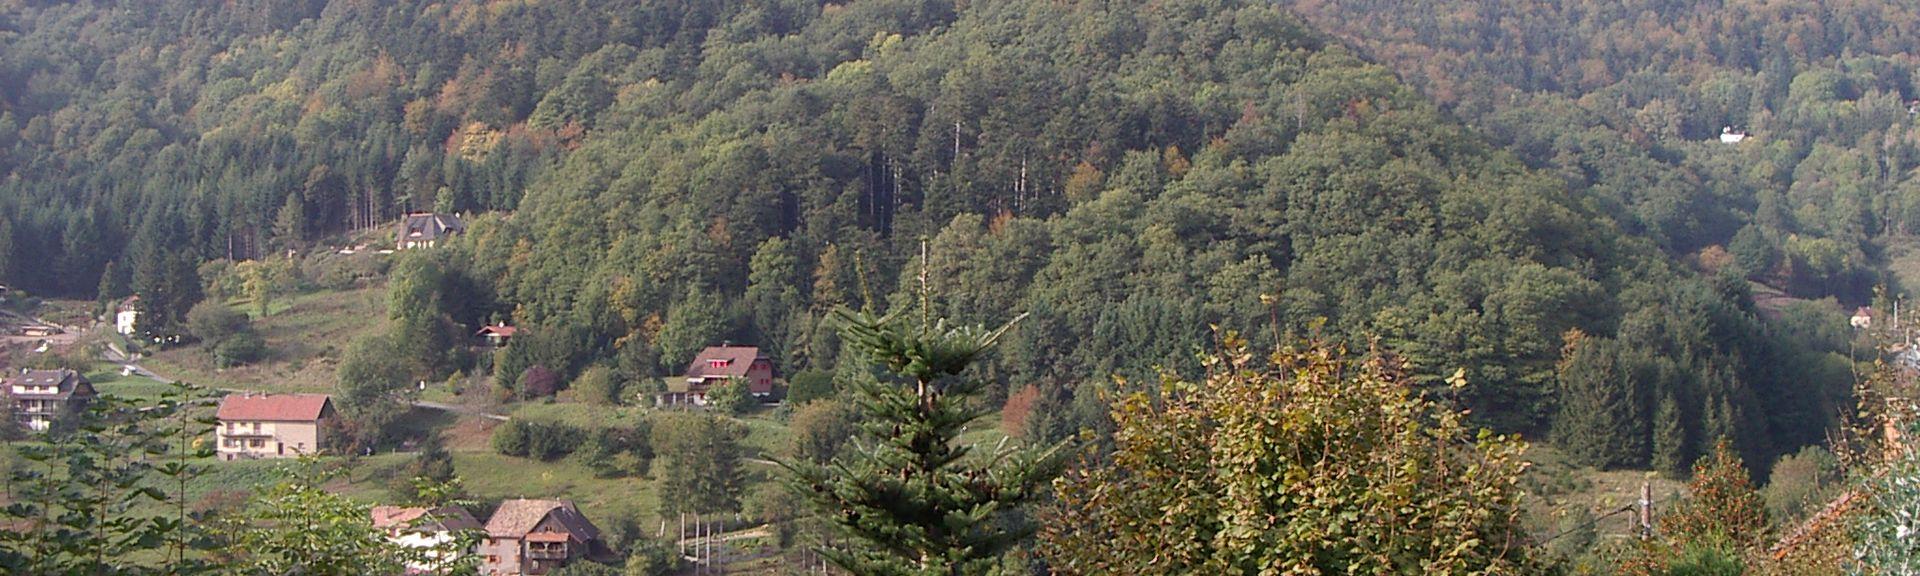 Station Valdieu-Lutran, Valdieu-Lutran, Haut-Rhin (departement), Frankrijk